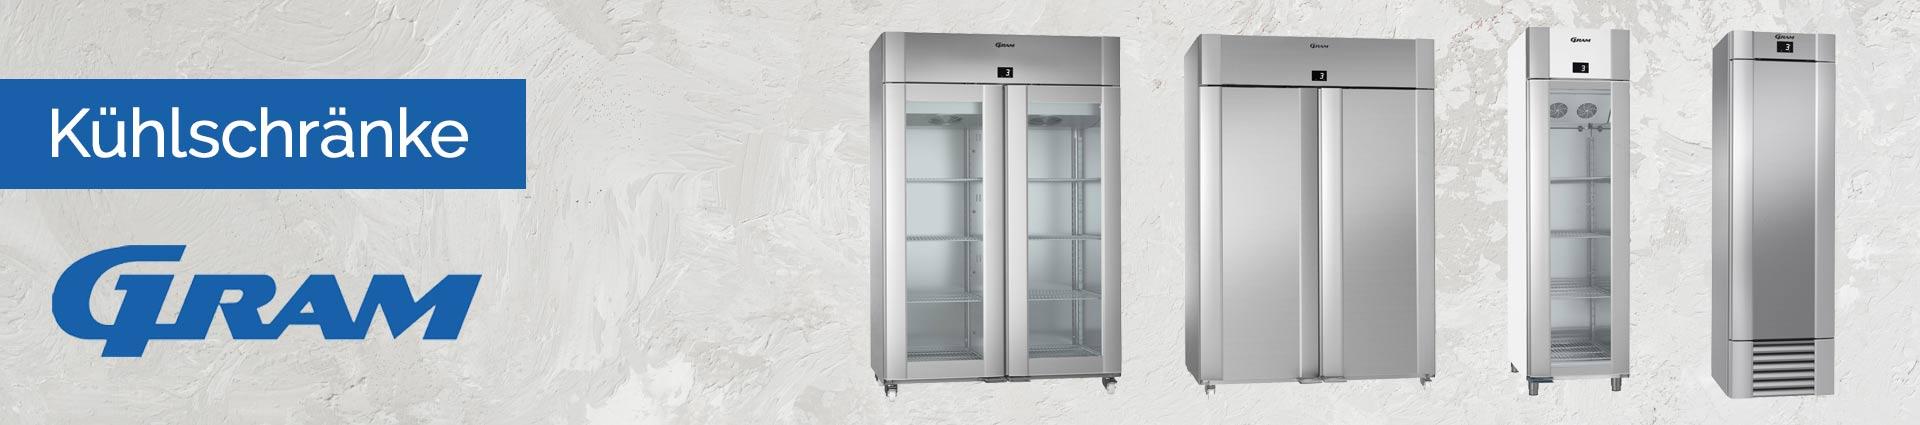 GRAM Kühlschränke Banner